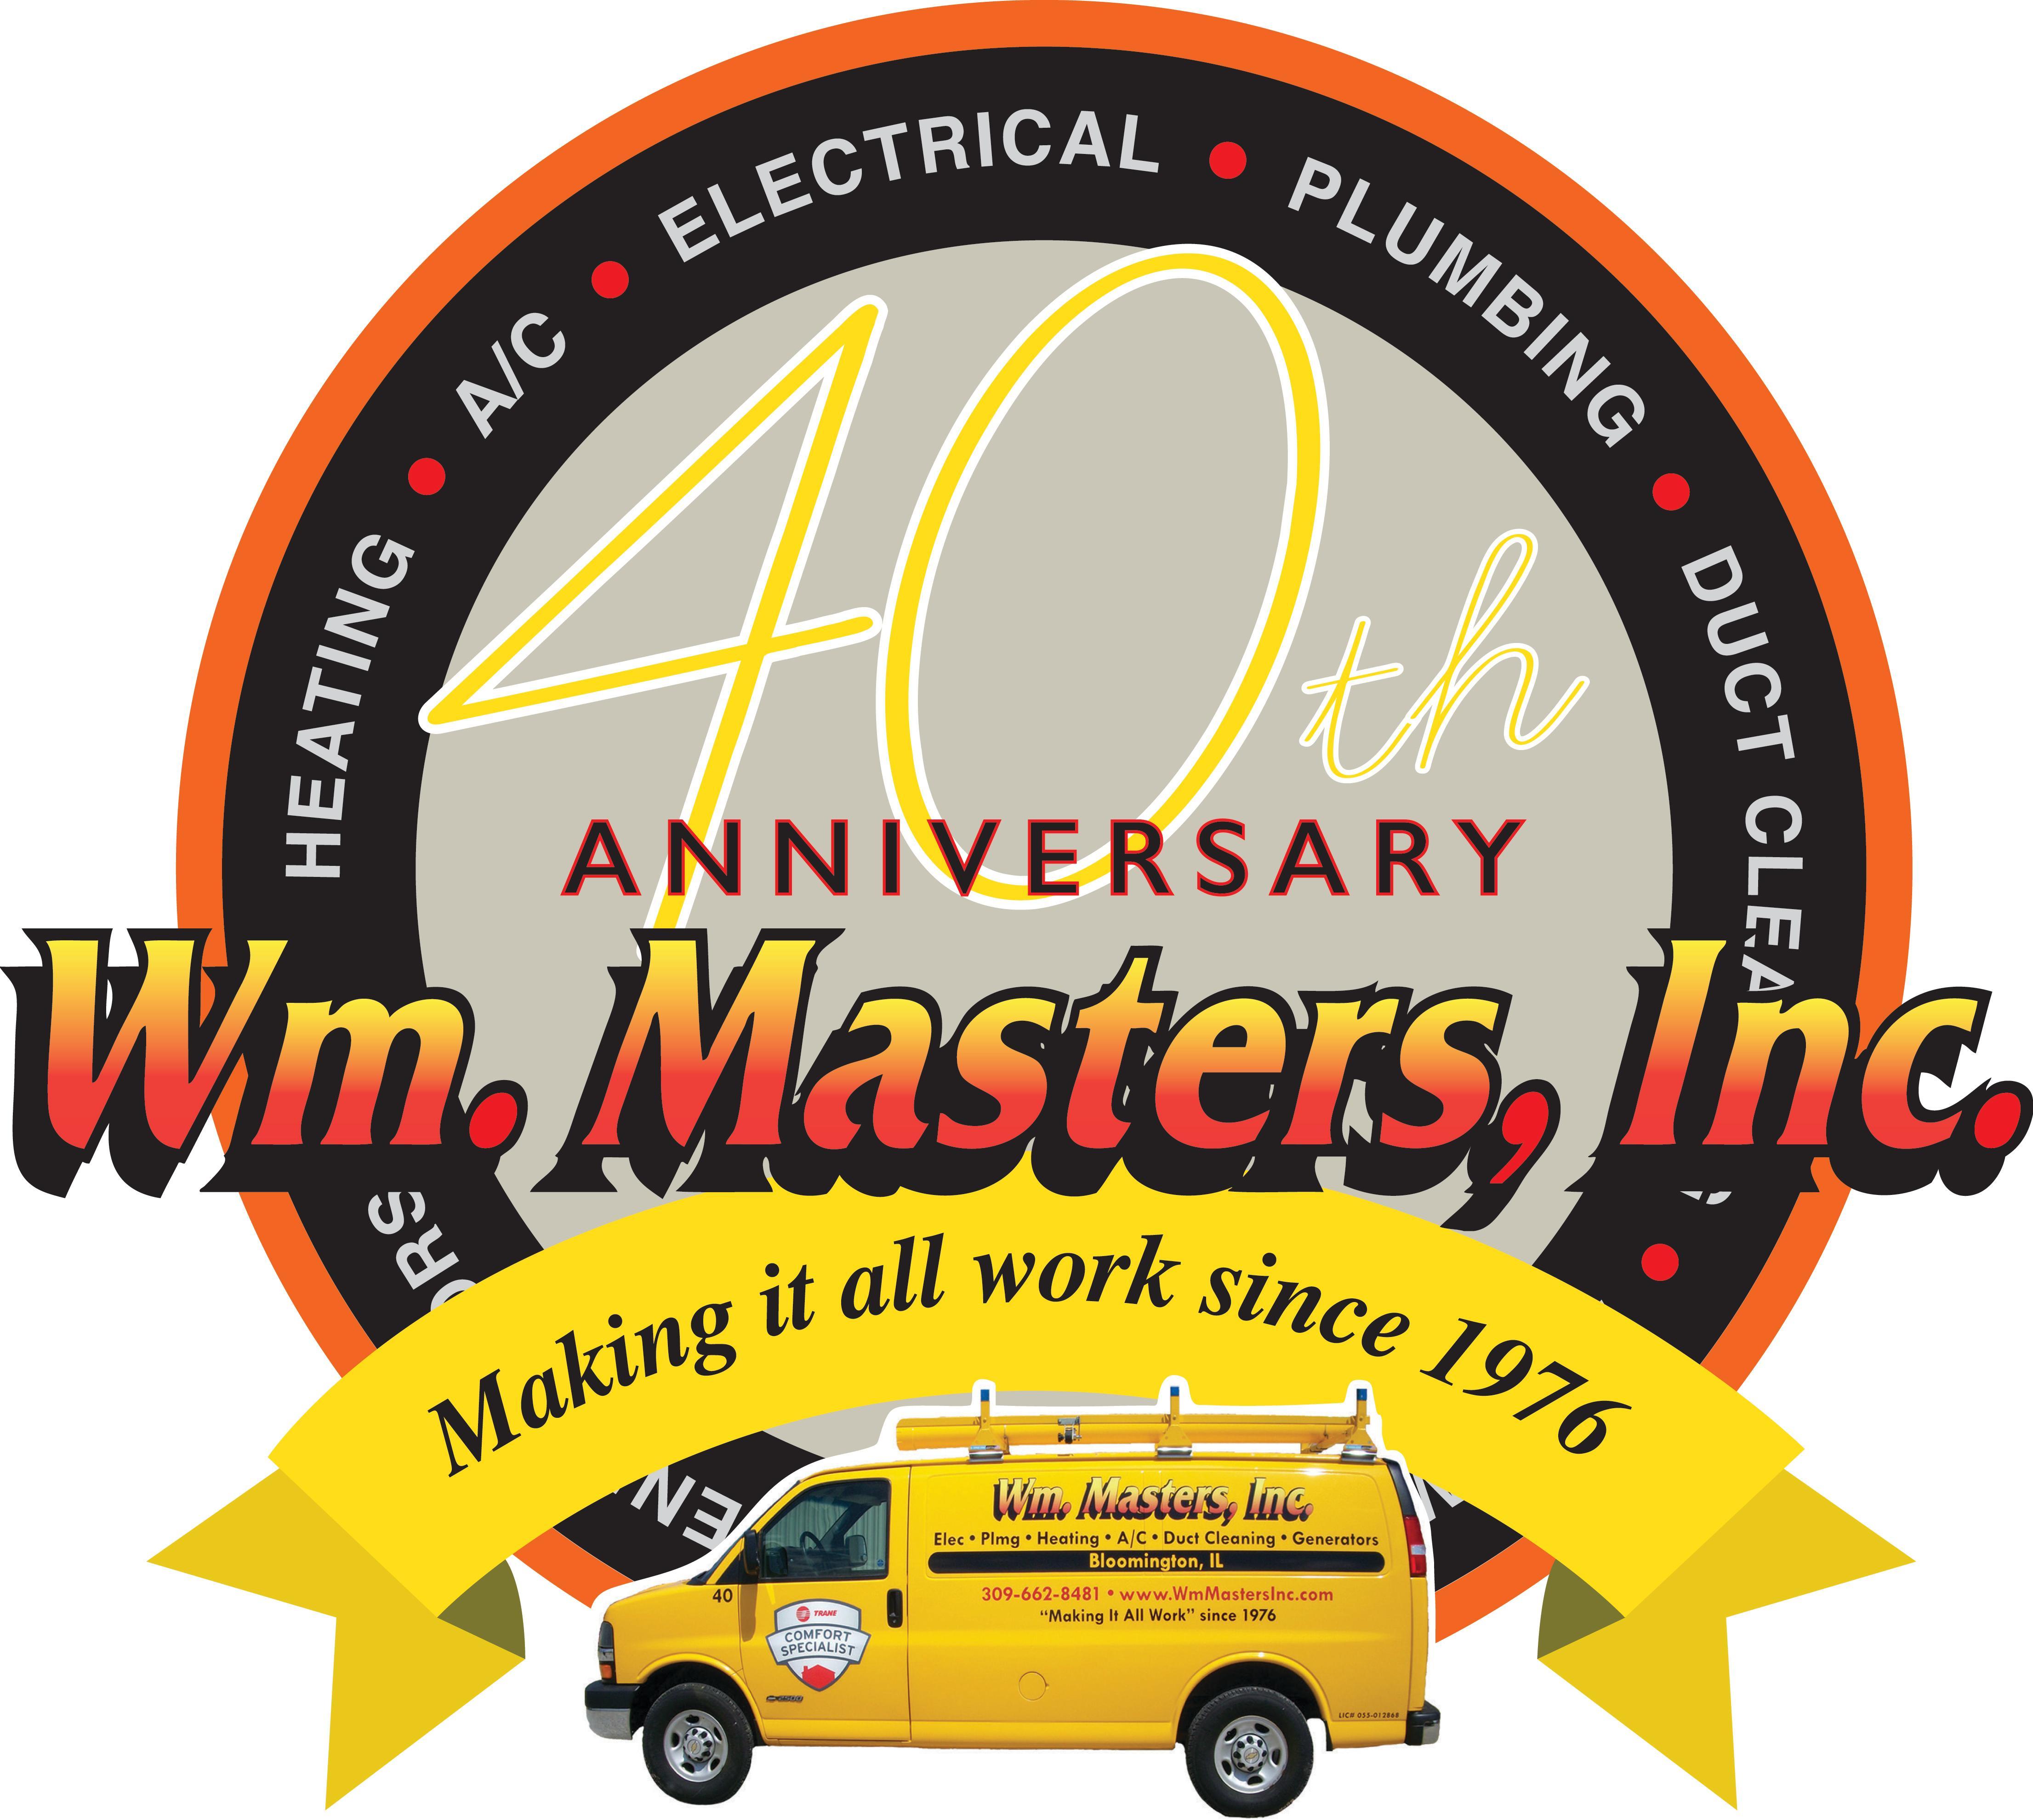 Wm. Masters, Inc image 3